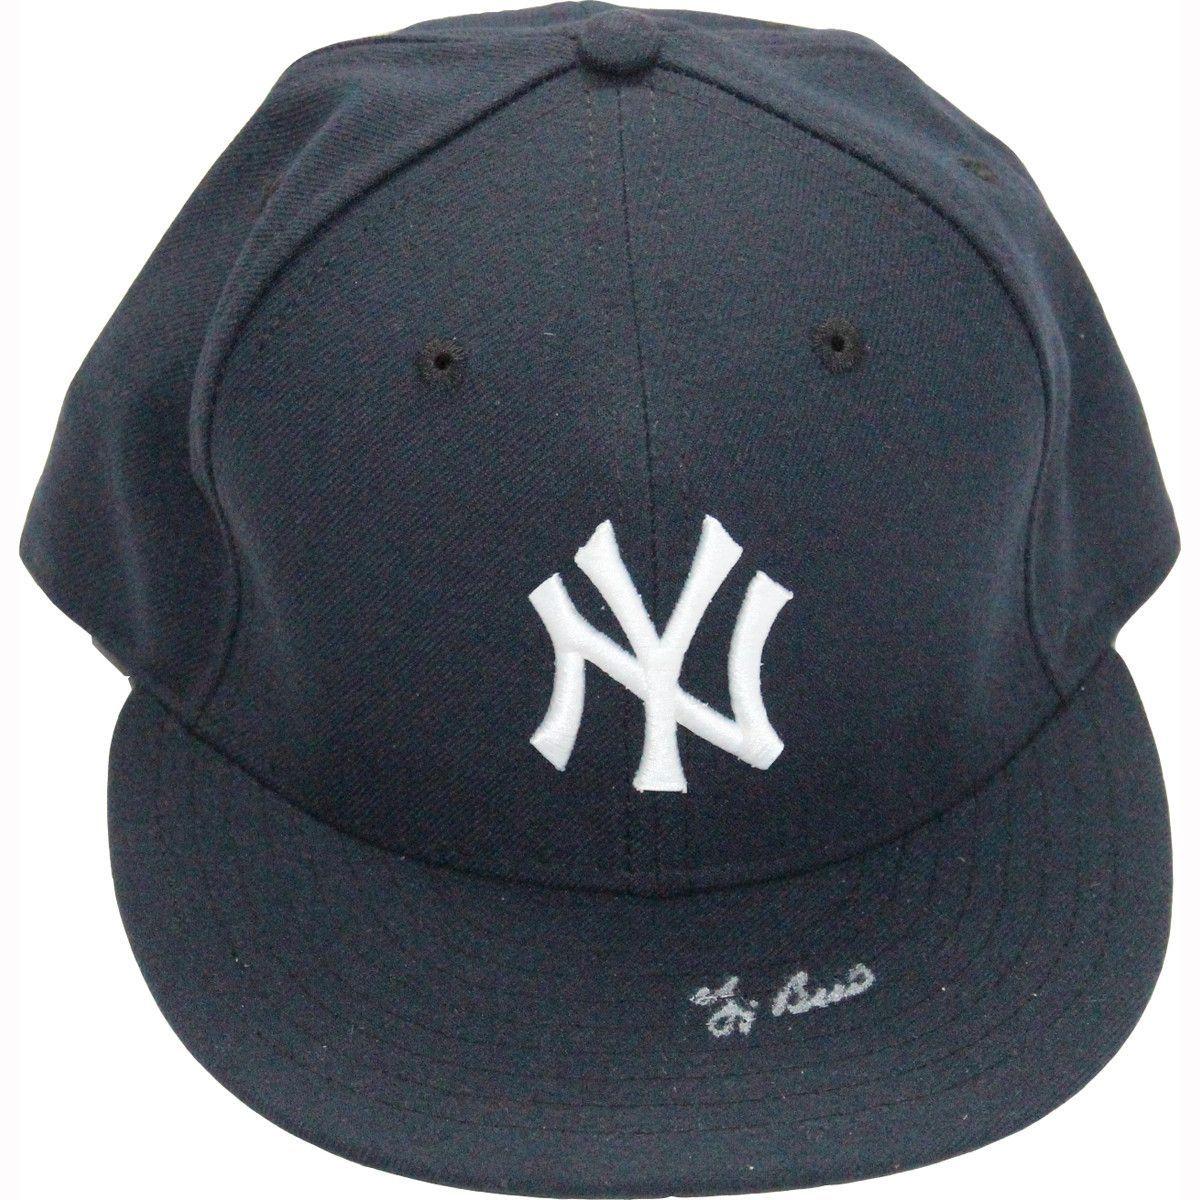 4a3f9ce7ac9 Yogi Berra Signed New York Yankees Hat ( MLB Auth) Size  7 3 8 ...